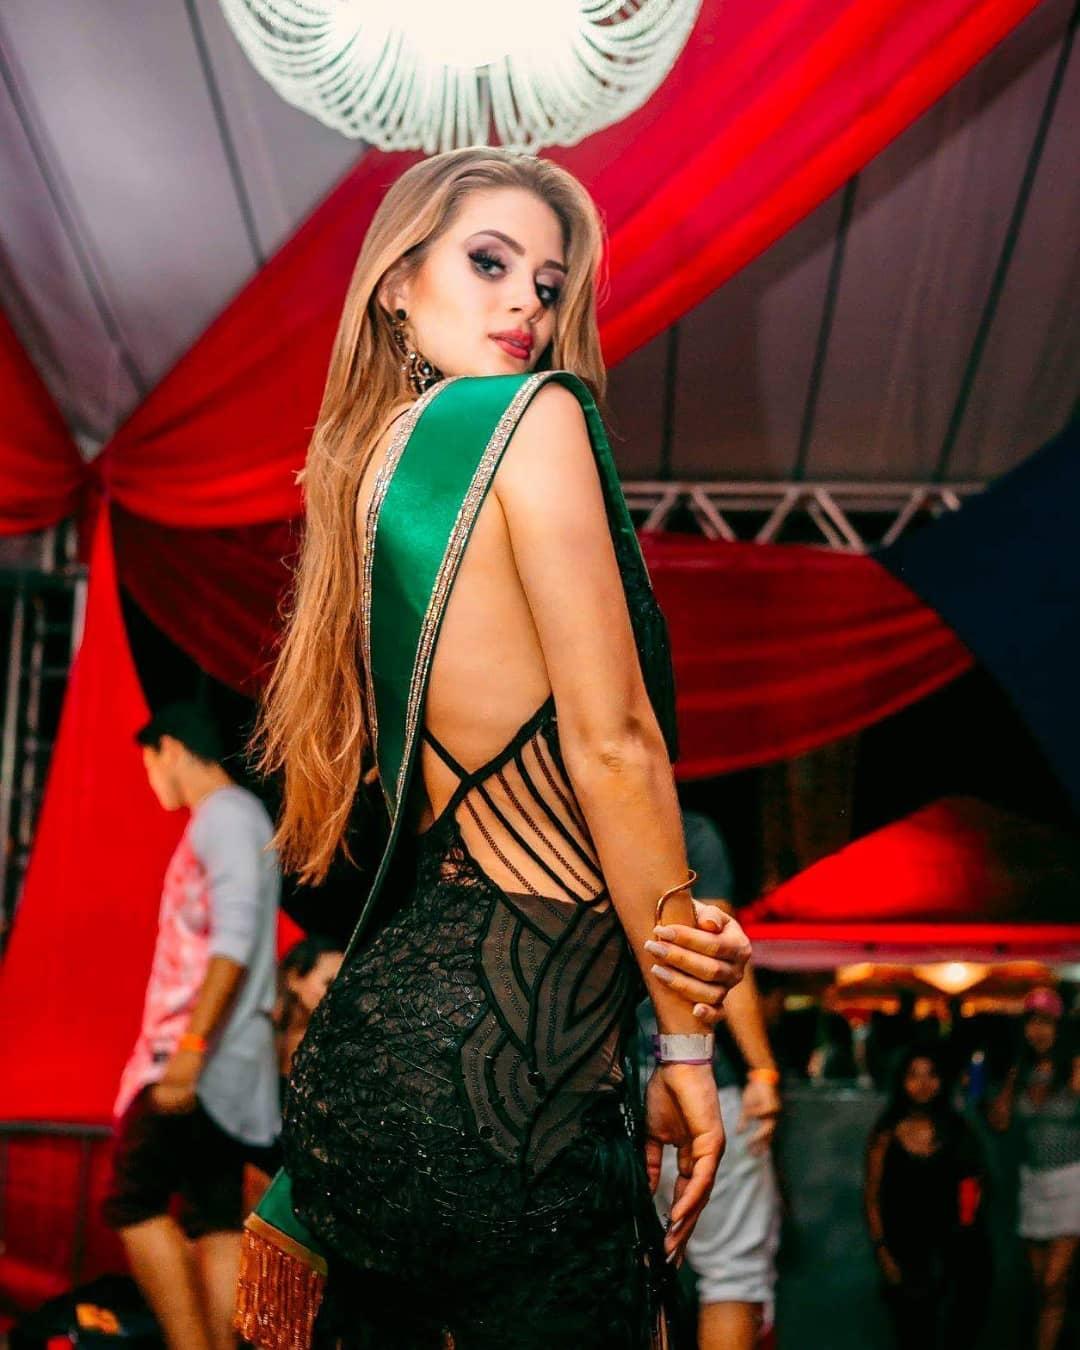 gabriela palma, miss brasil empresarial 2018. - Página 6 38938312